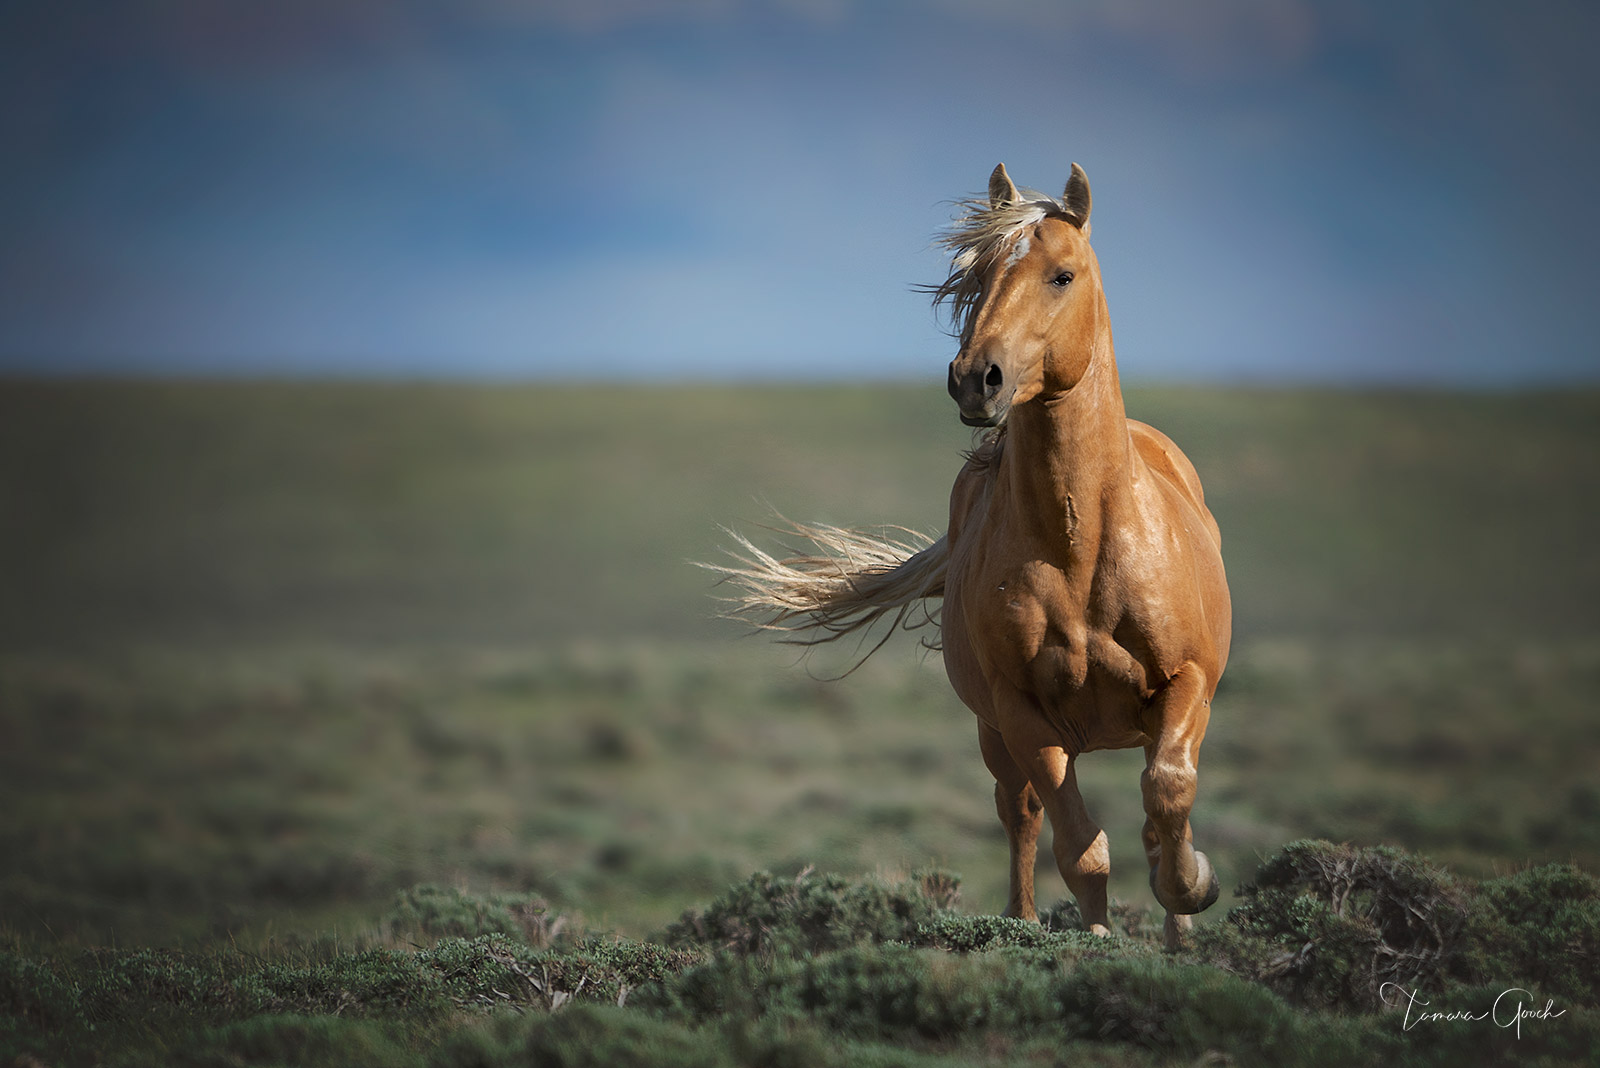 Palomino wild horse mustang stallion fine art print, equine, horse, mustang, wild, palomino, stallion, sage brush, range, metal, canvas, aluminum, paper, trulife Acrylic print, framed, exhibition, rea, photo